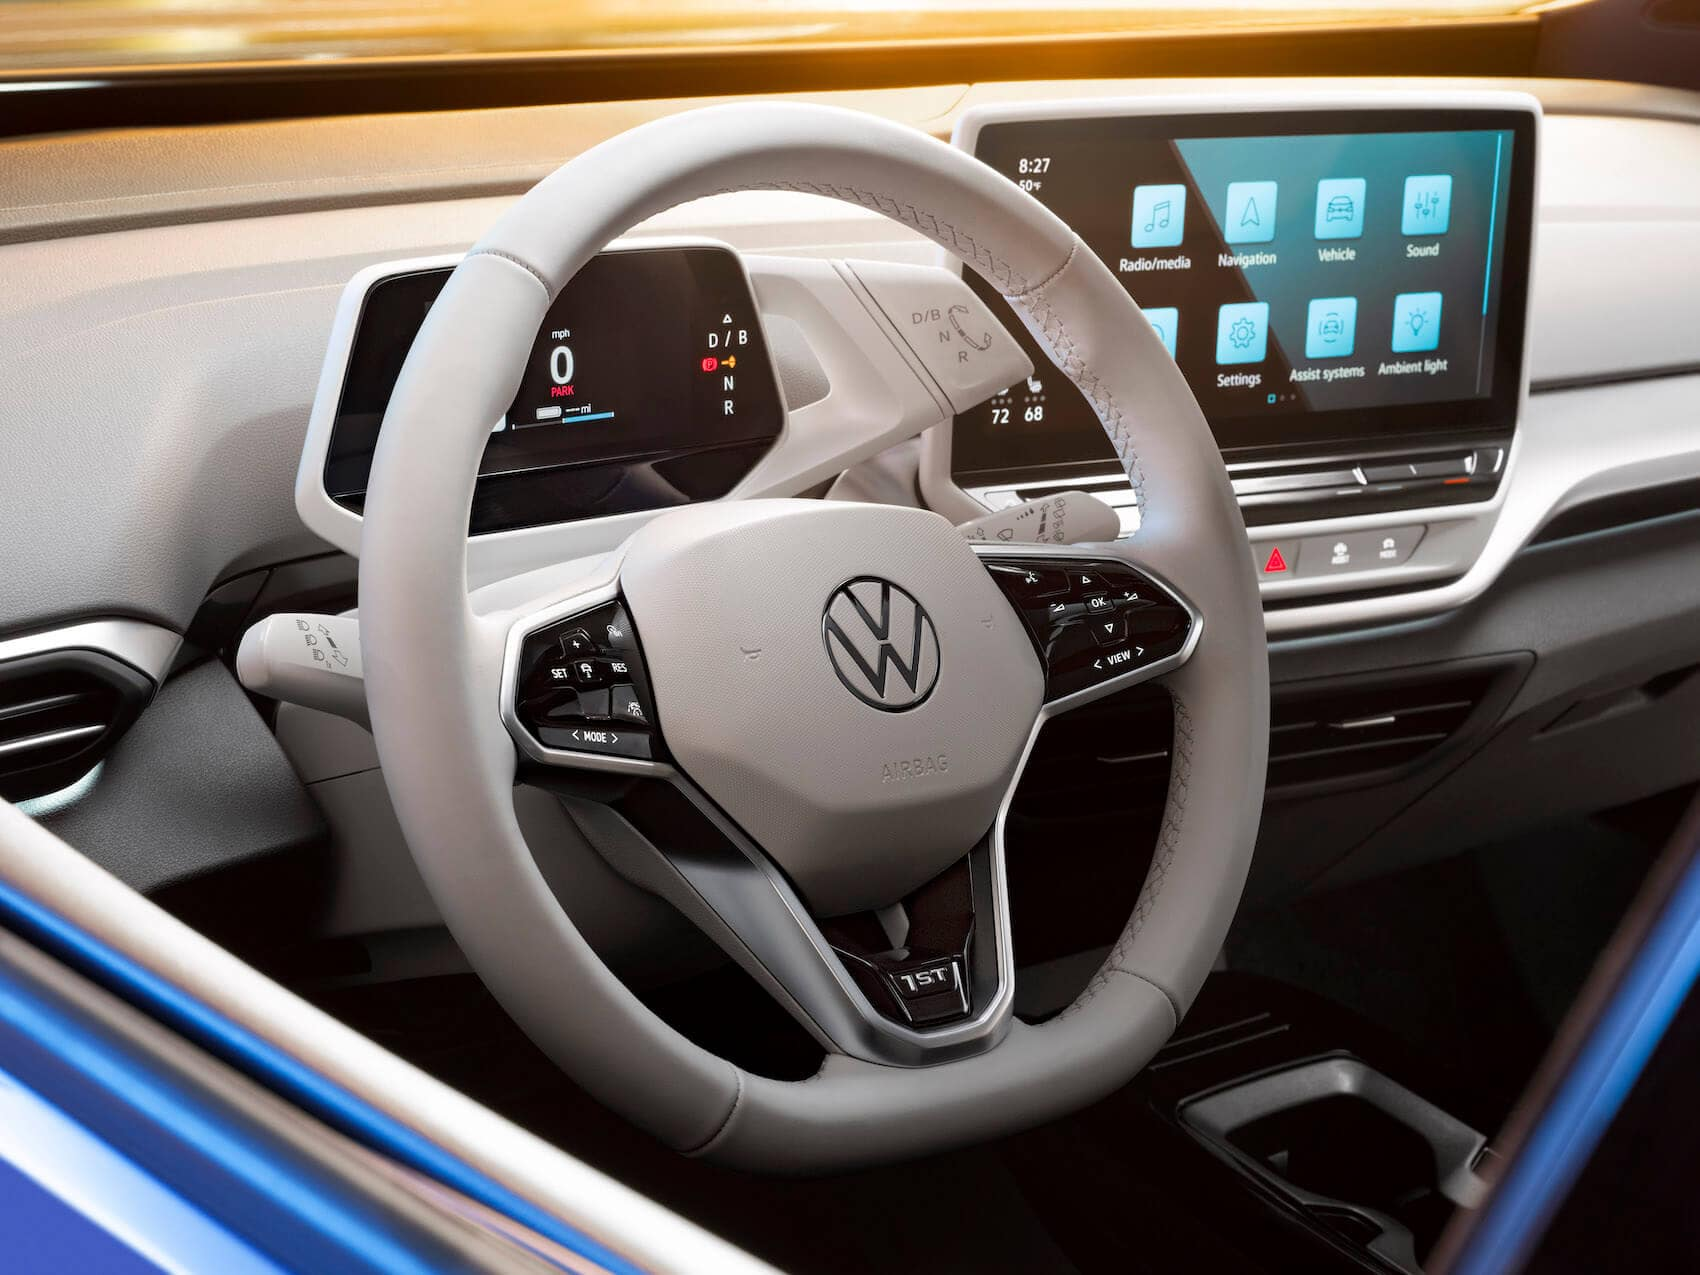 2021 Volkswagen ID.4 EV Interior Dimensions | McDonald VW